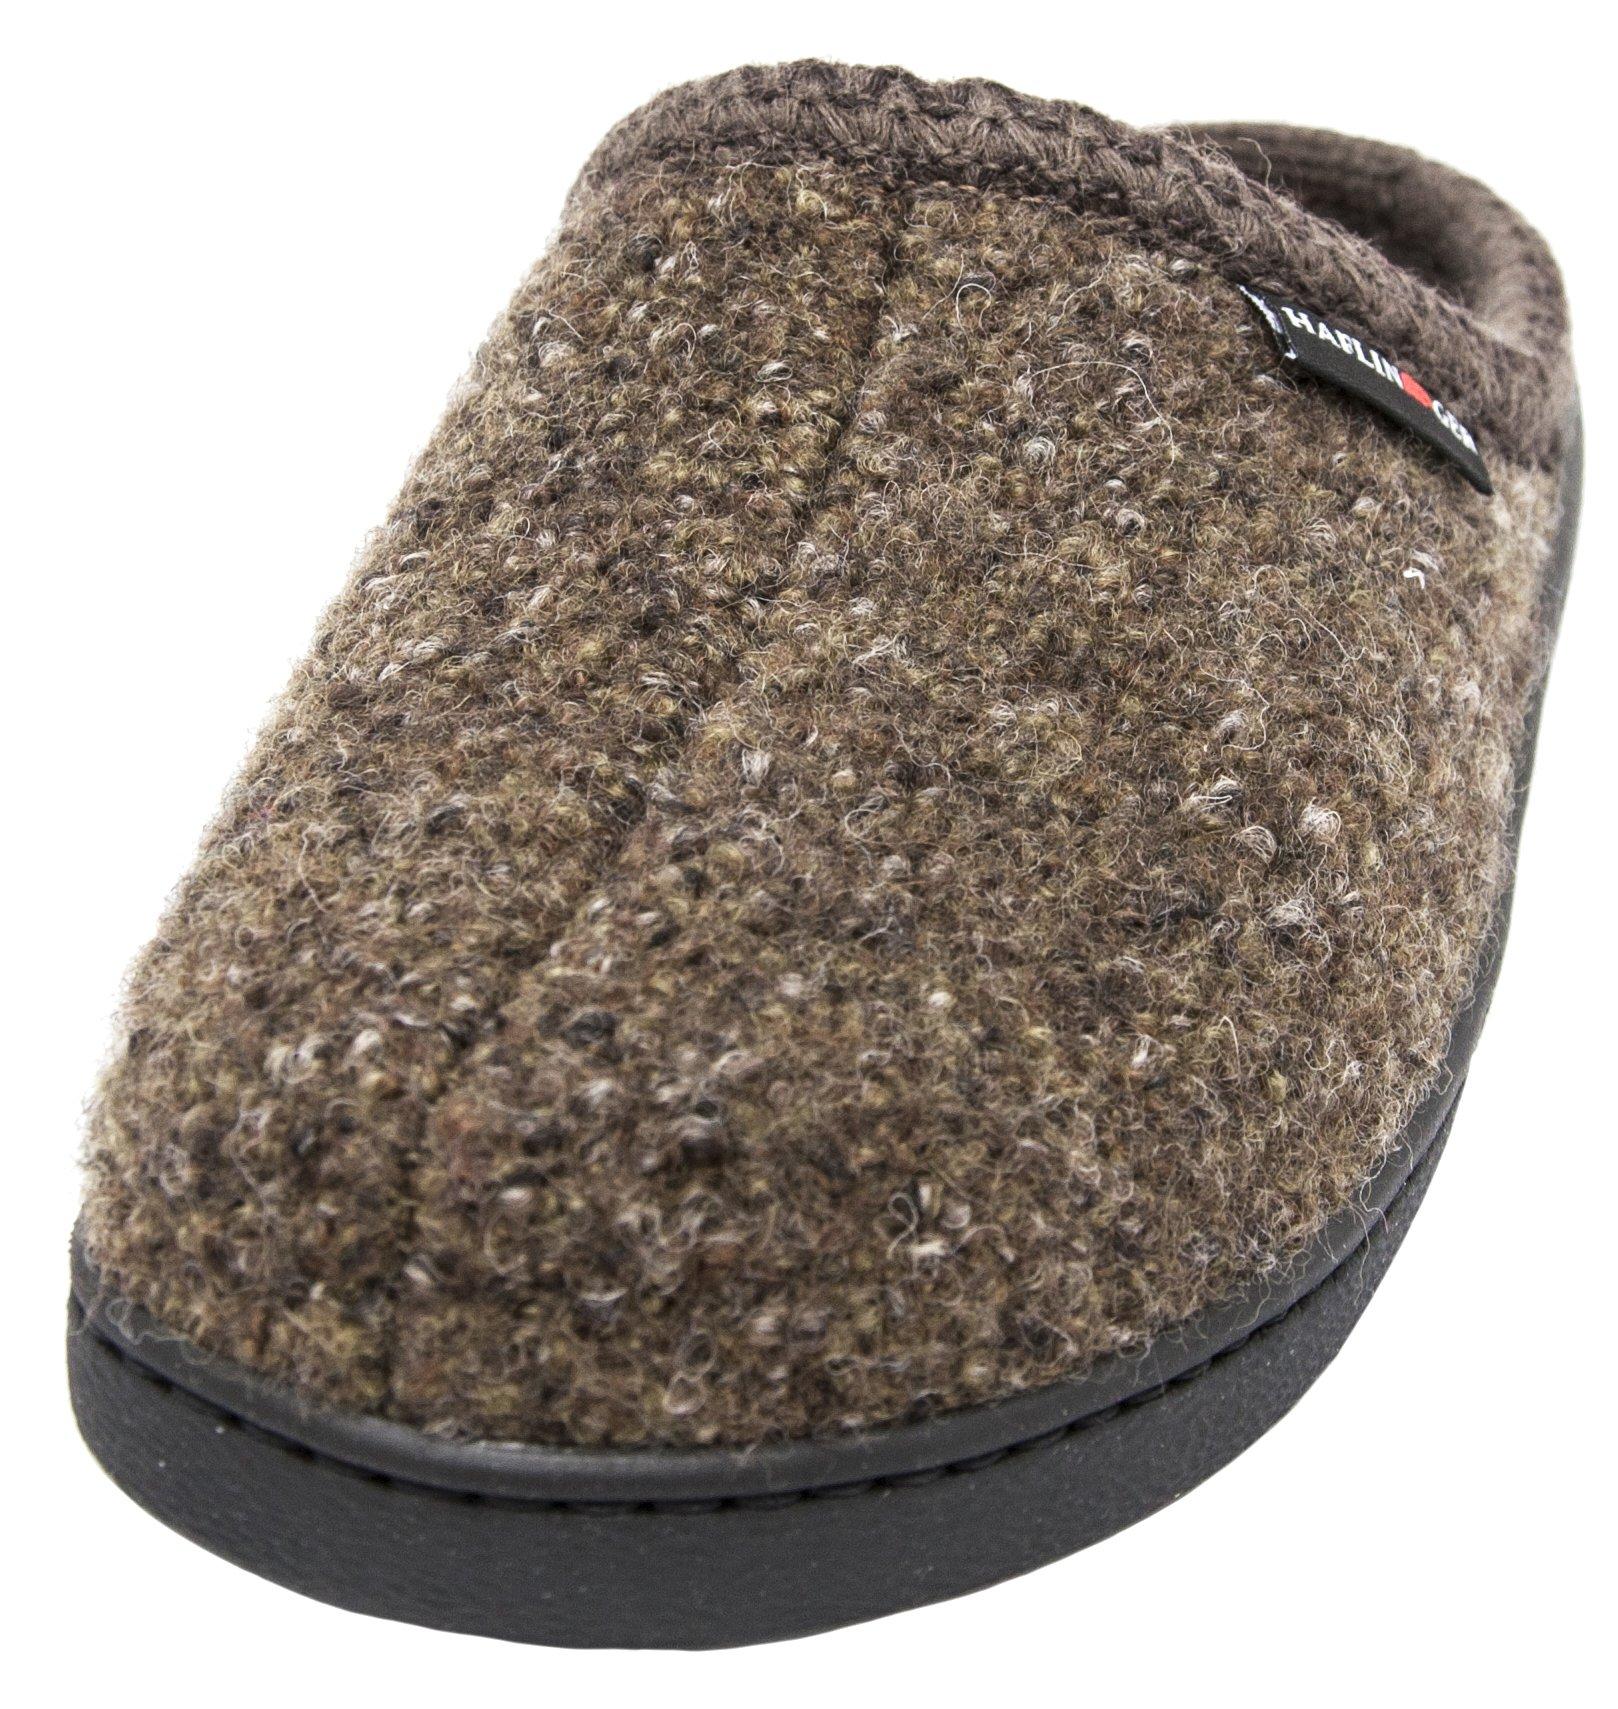 Haflinger Unisex AT Boiled Wool Hard Sole Slipper (42 M EU / 11 B(M) US, Khaki Speckle)